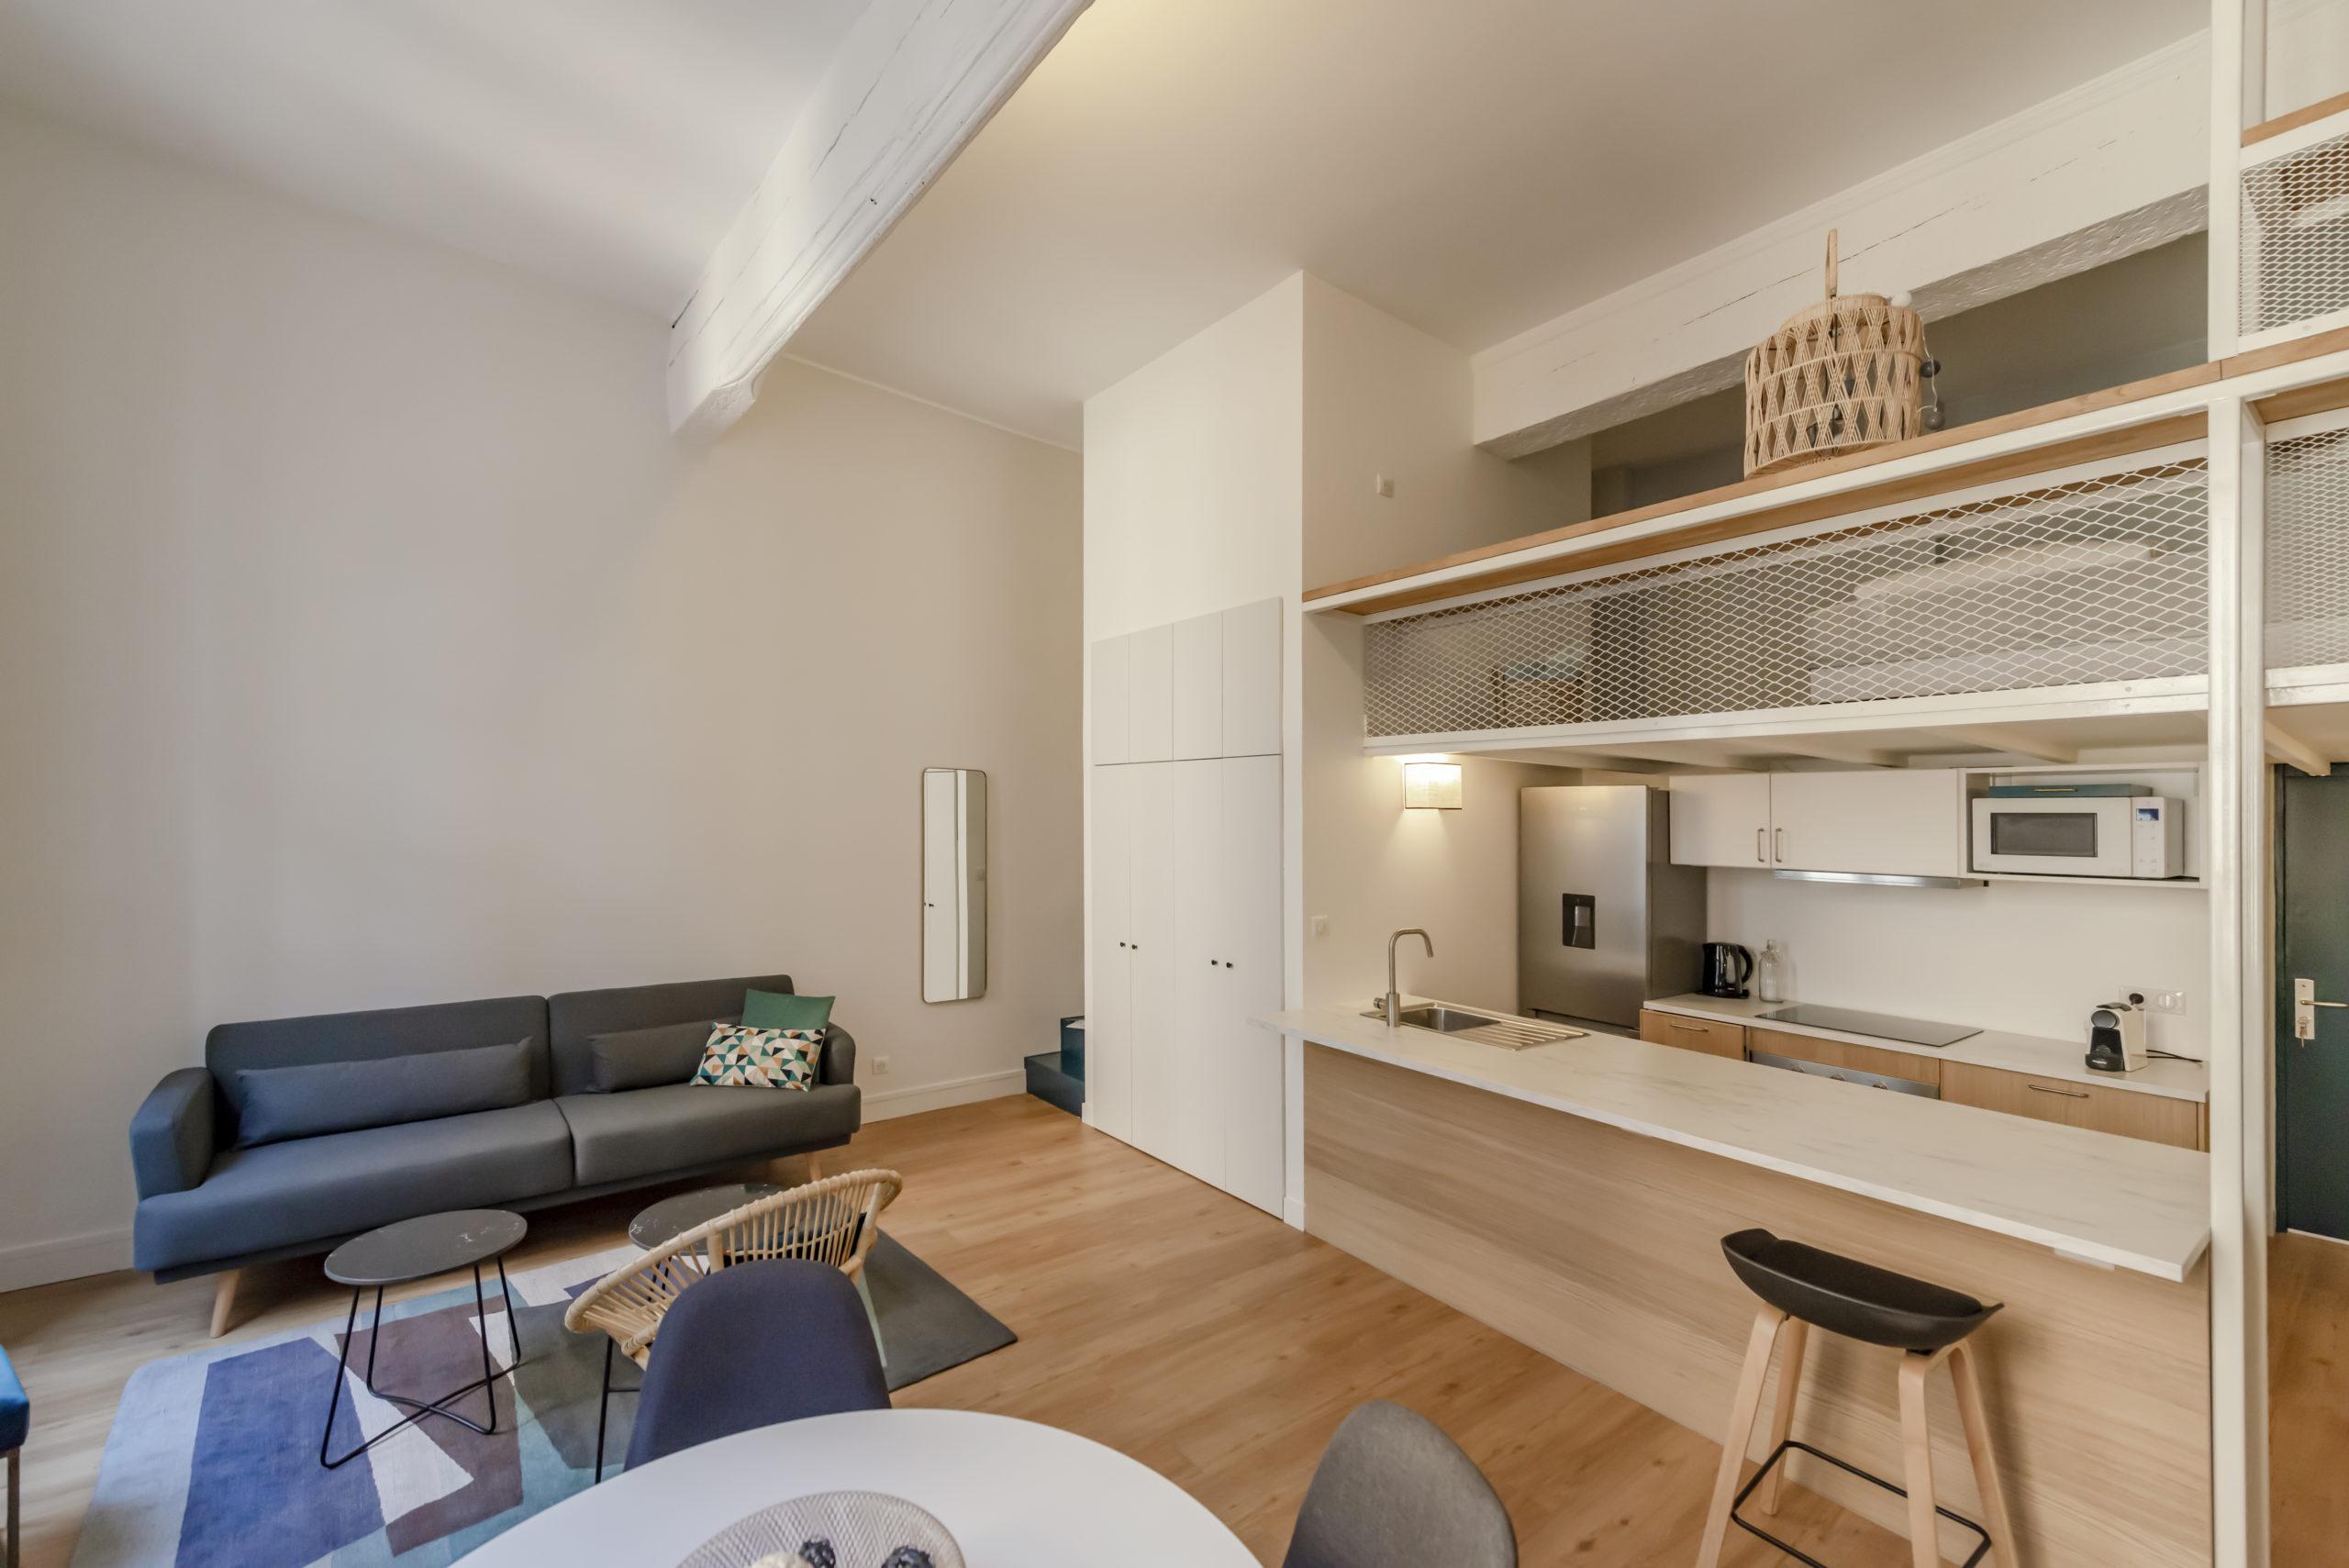 01-rénovation-cuisine-studio-mezzanine